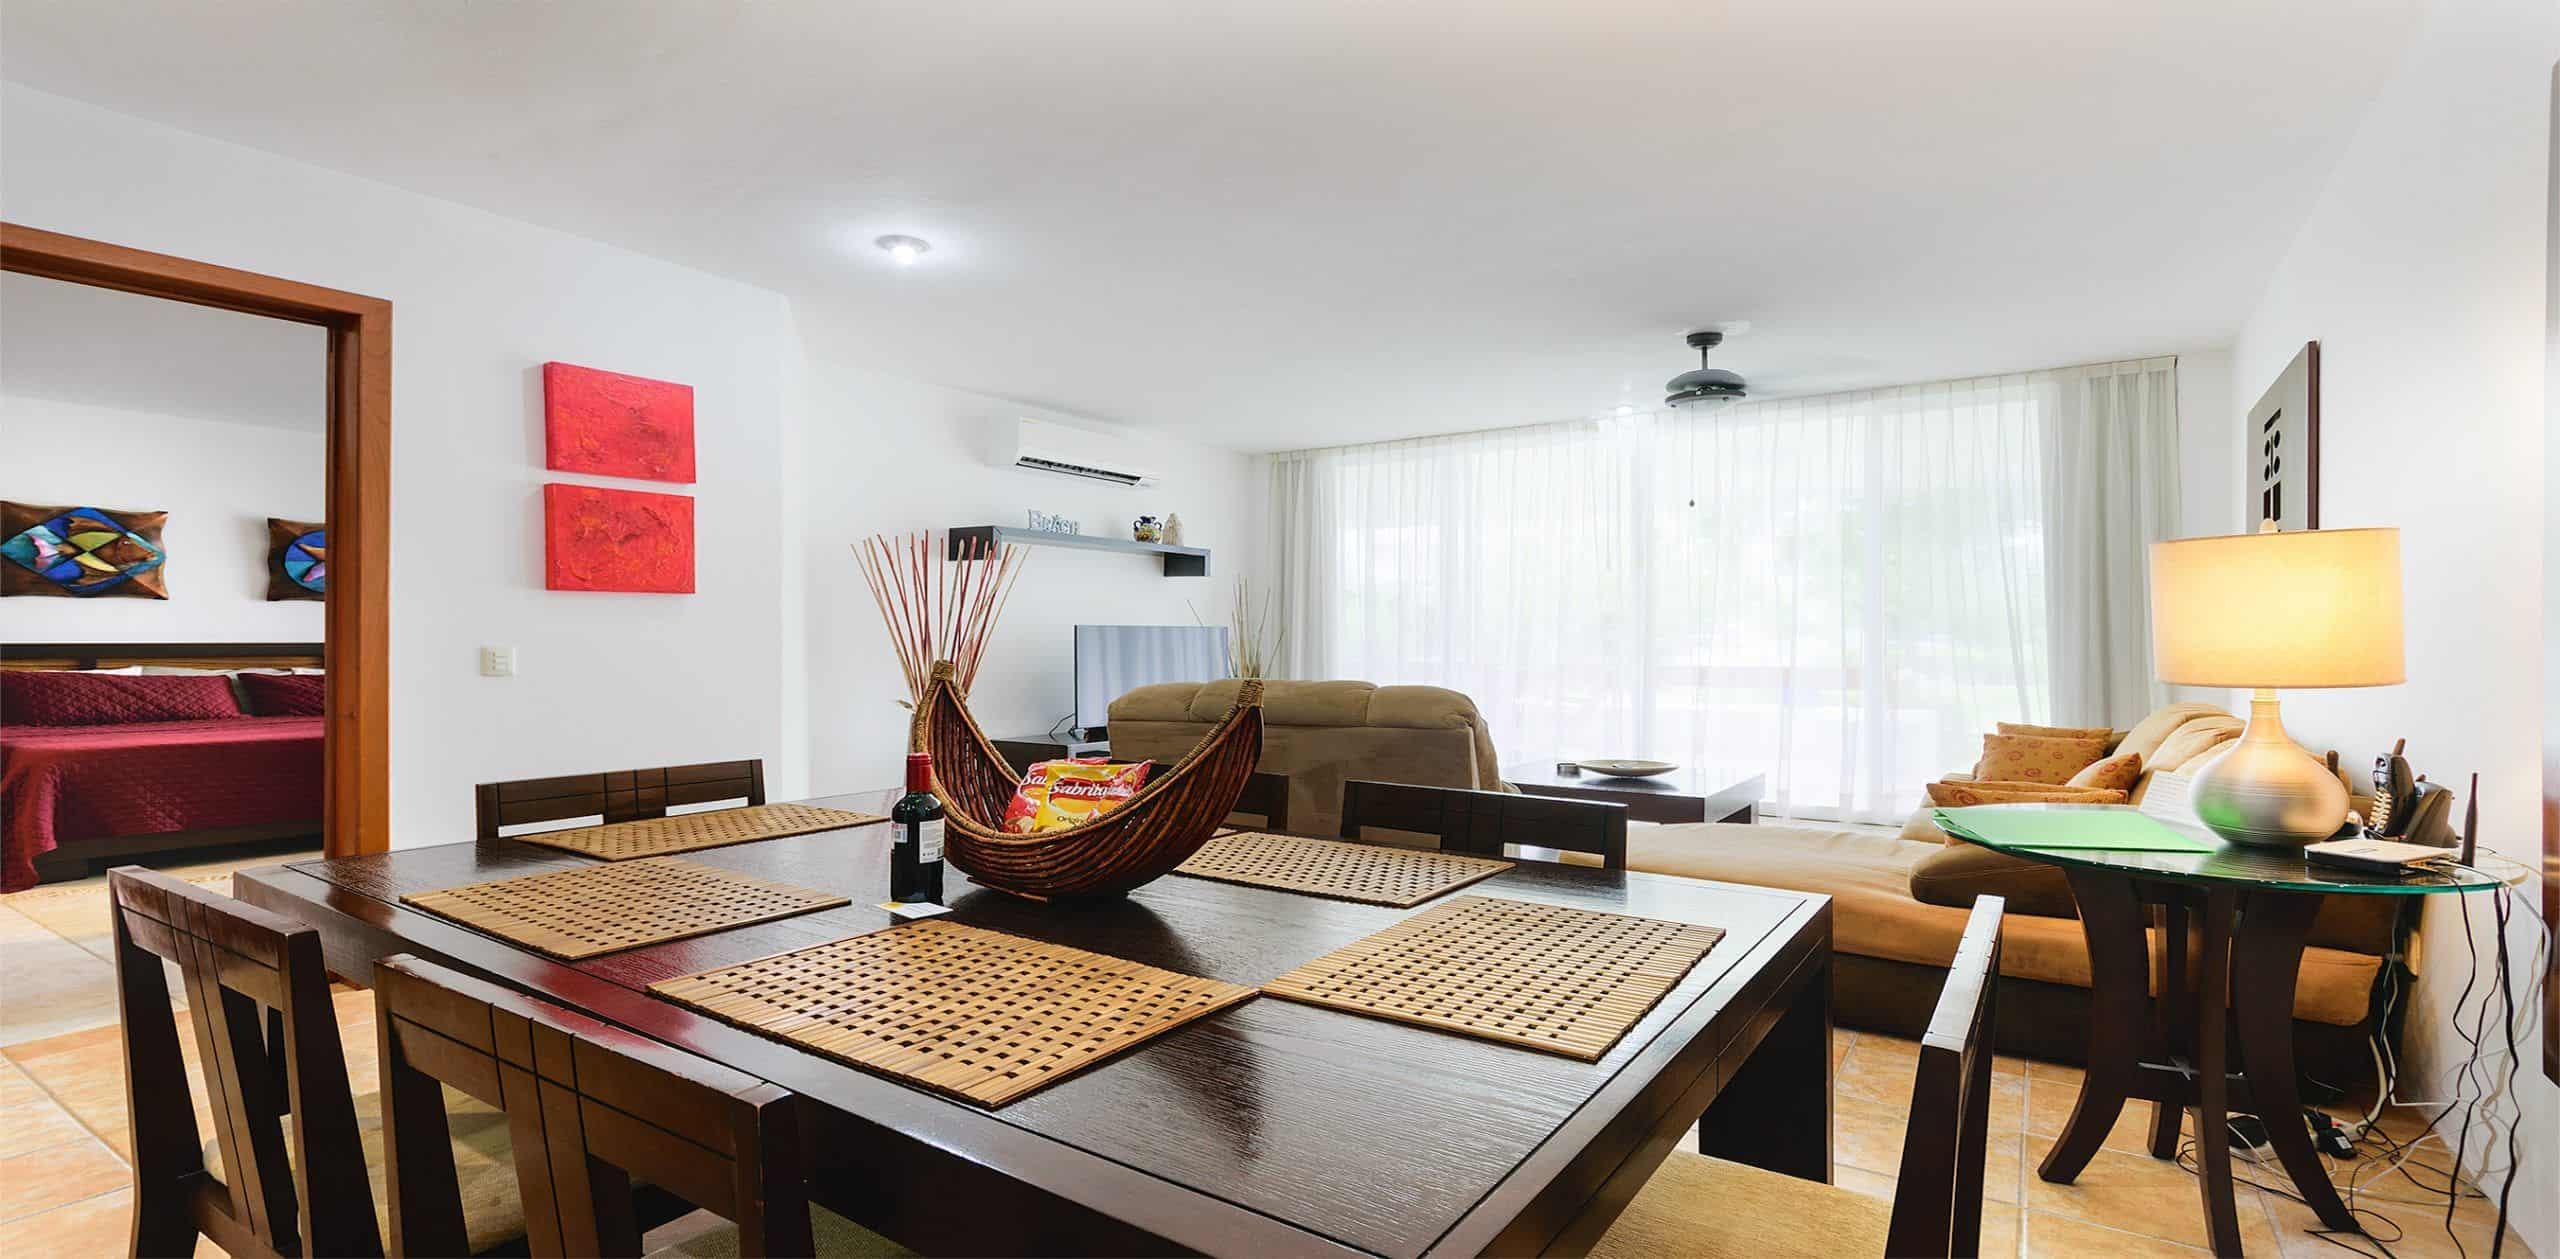 residencias reef 7110